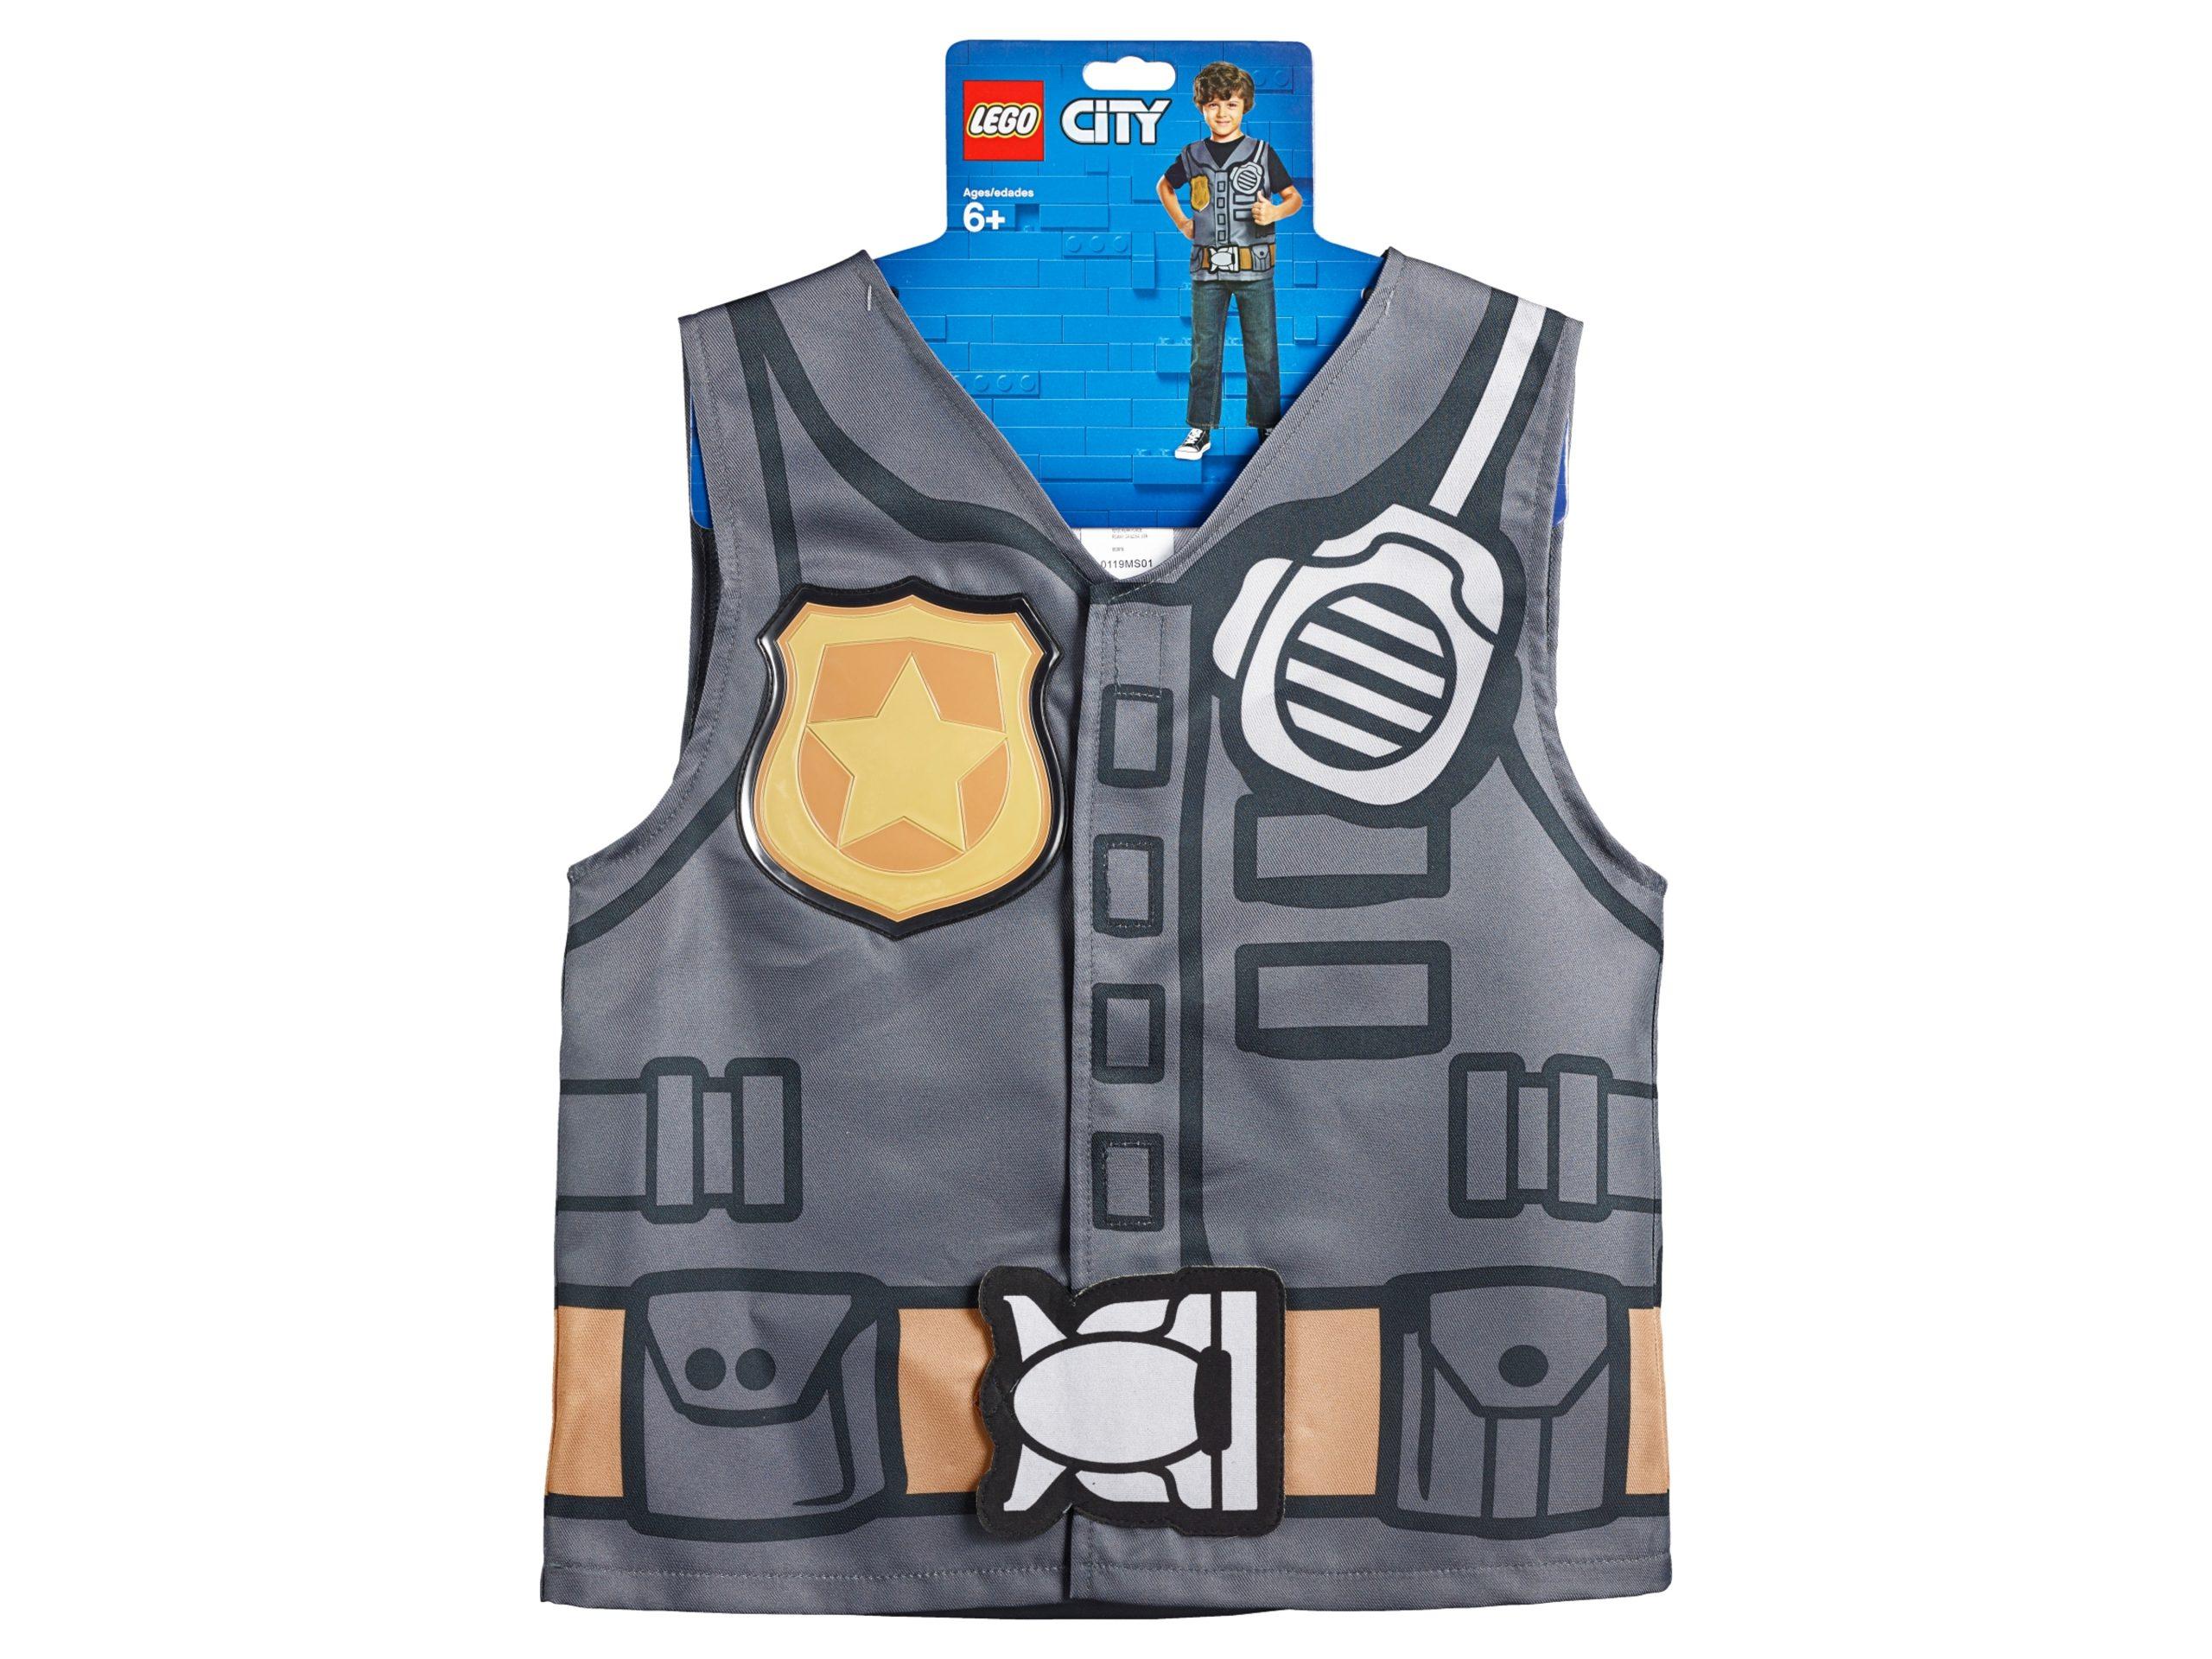 lego 853919 city police vest scaled